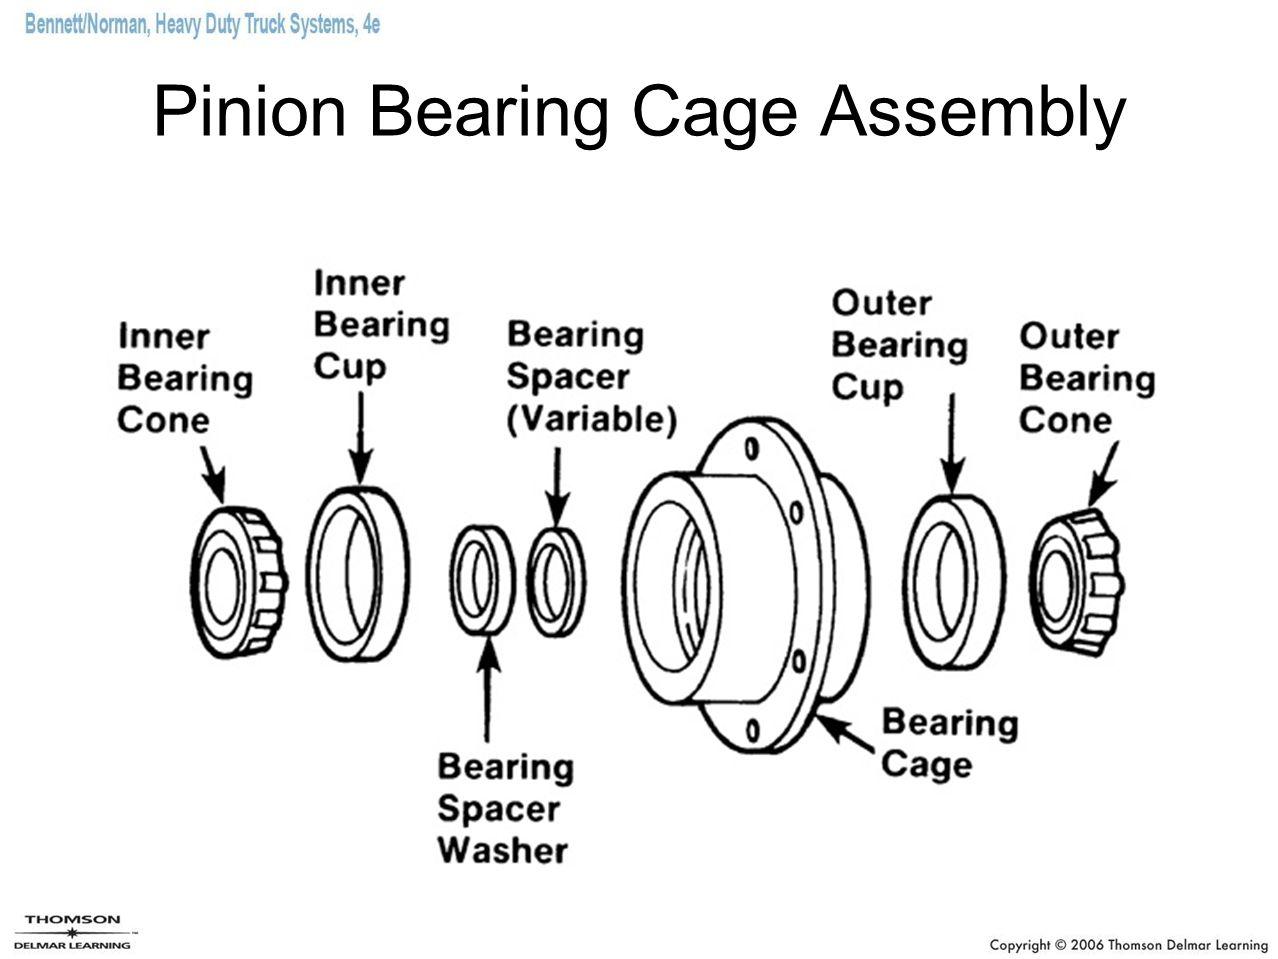 Pinion Bearing Cage Assembly